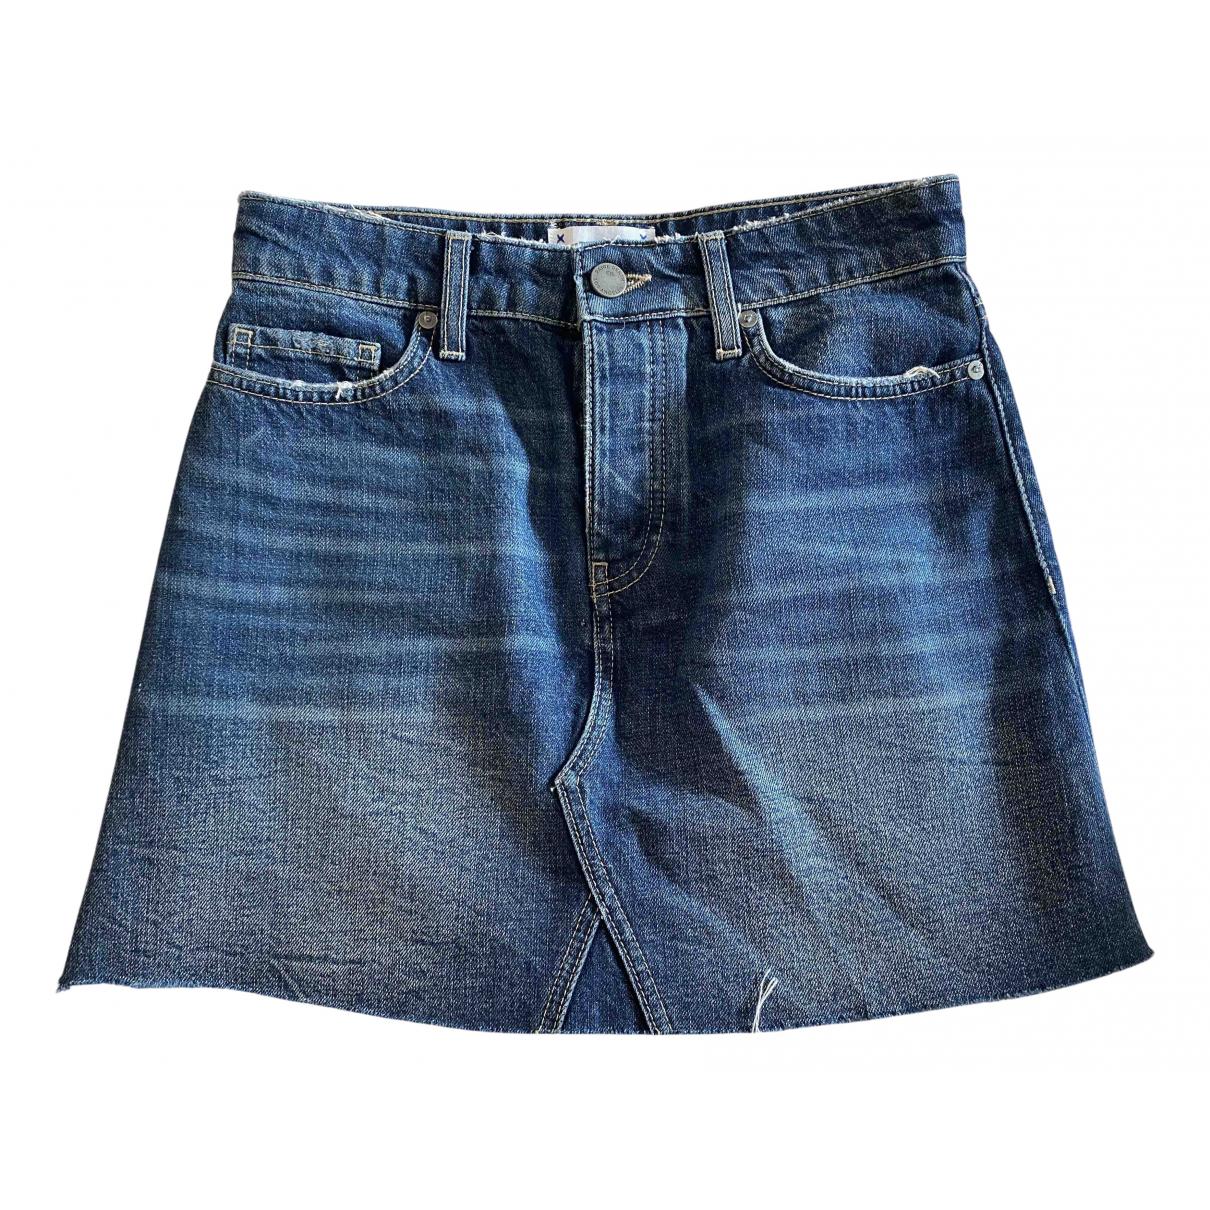 Paige Jeans N Blue Denim - Jeans skirt for Women 8 UK